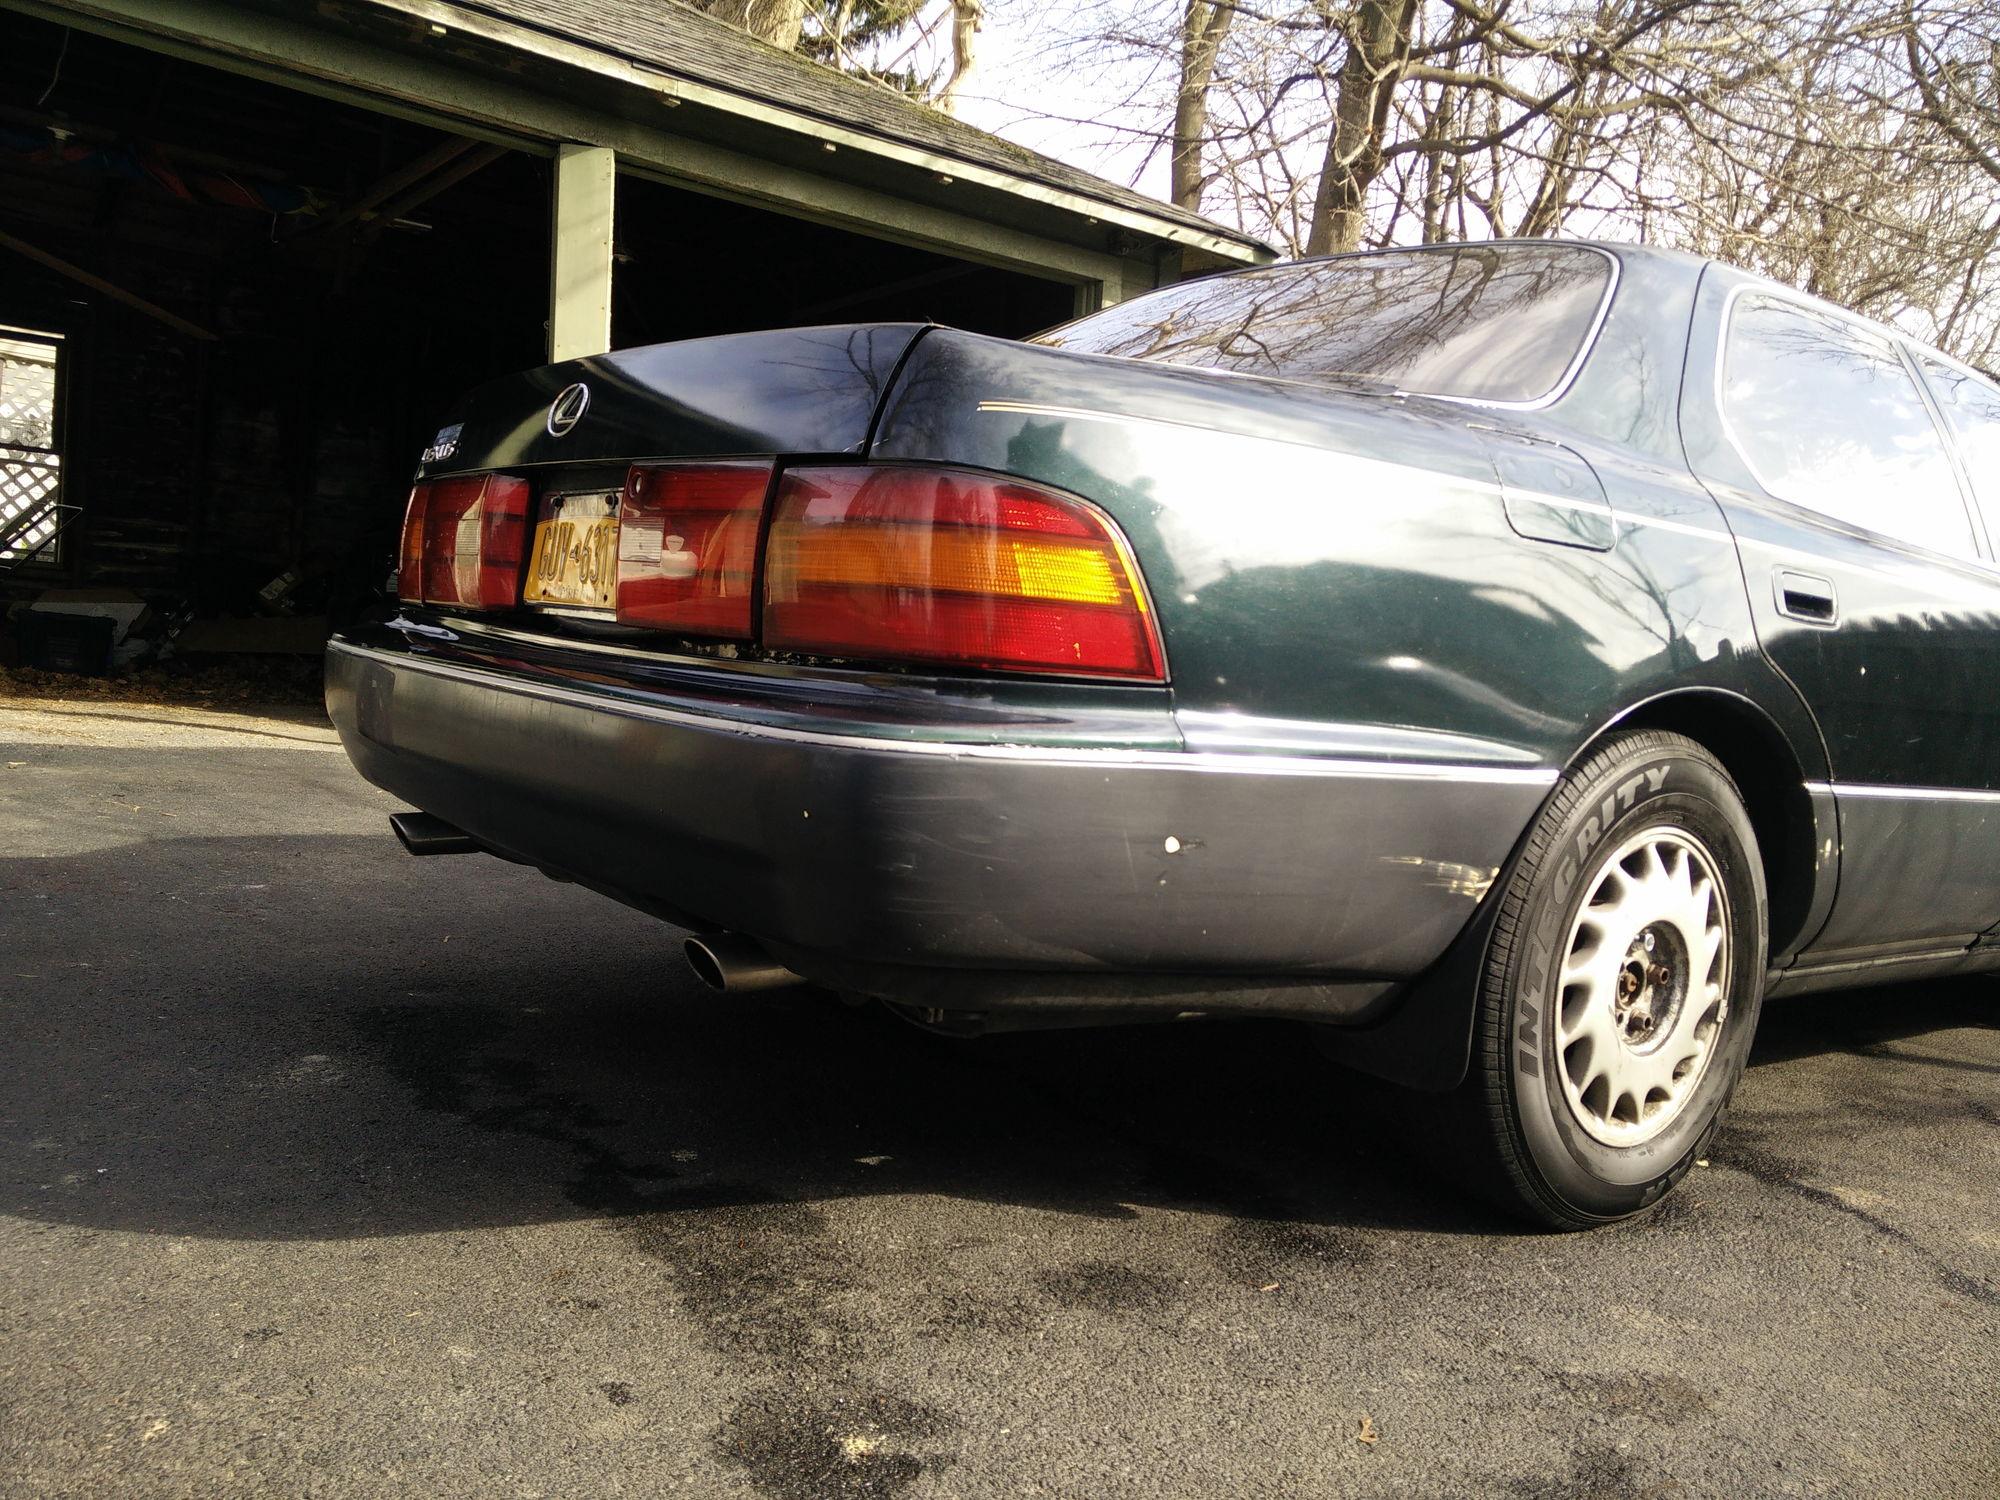 Dealer Sold Me A Car That Broke Down